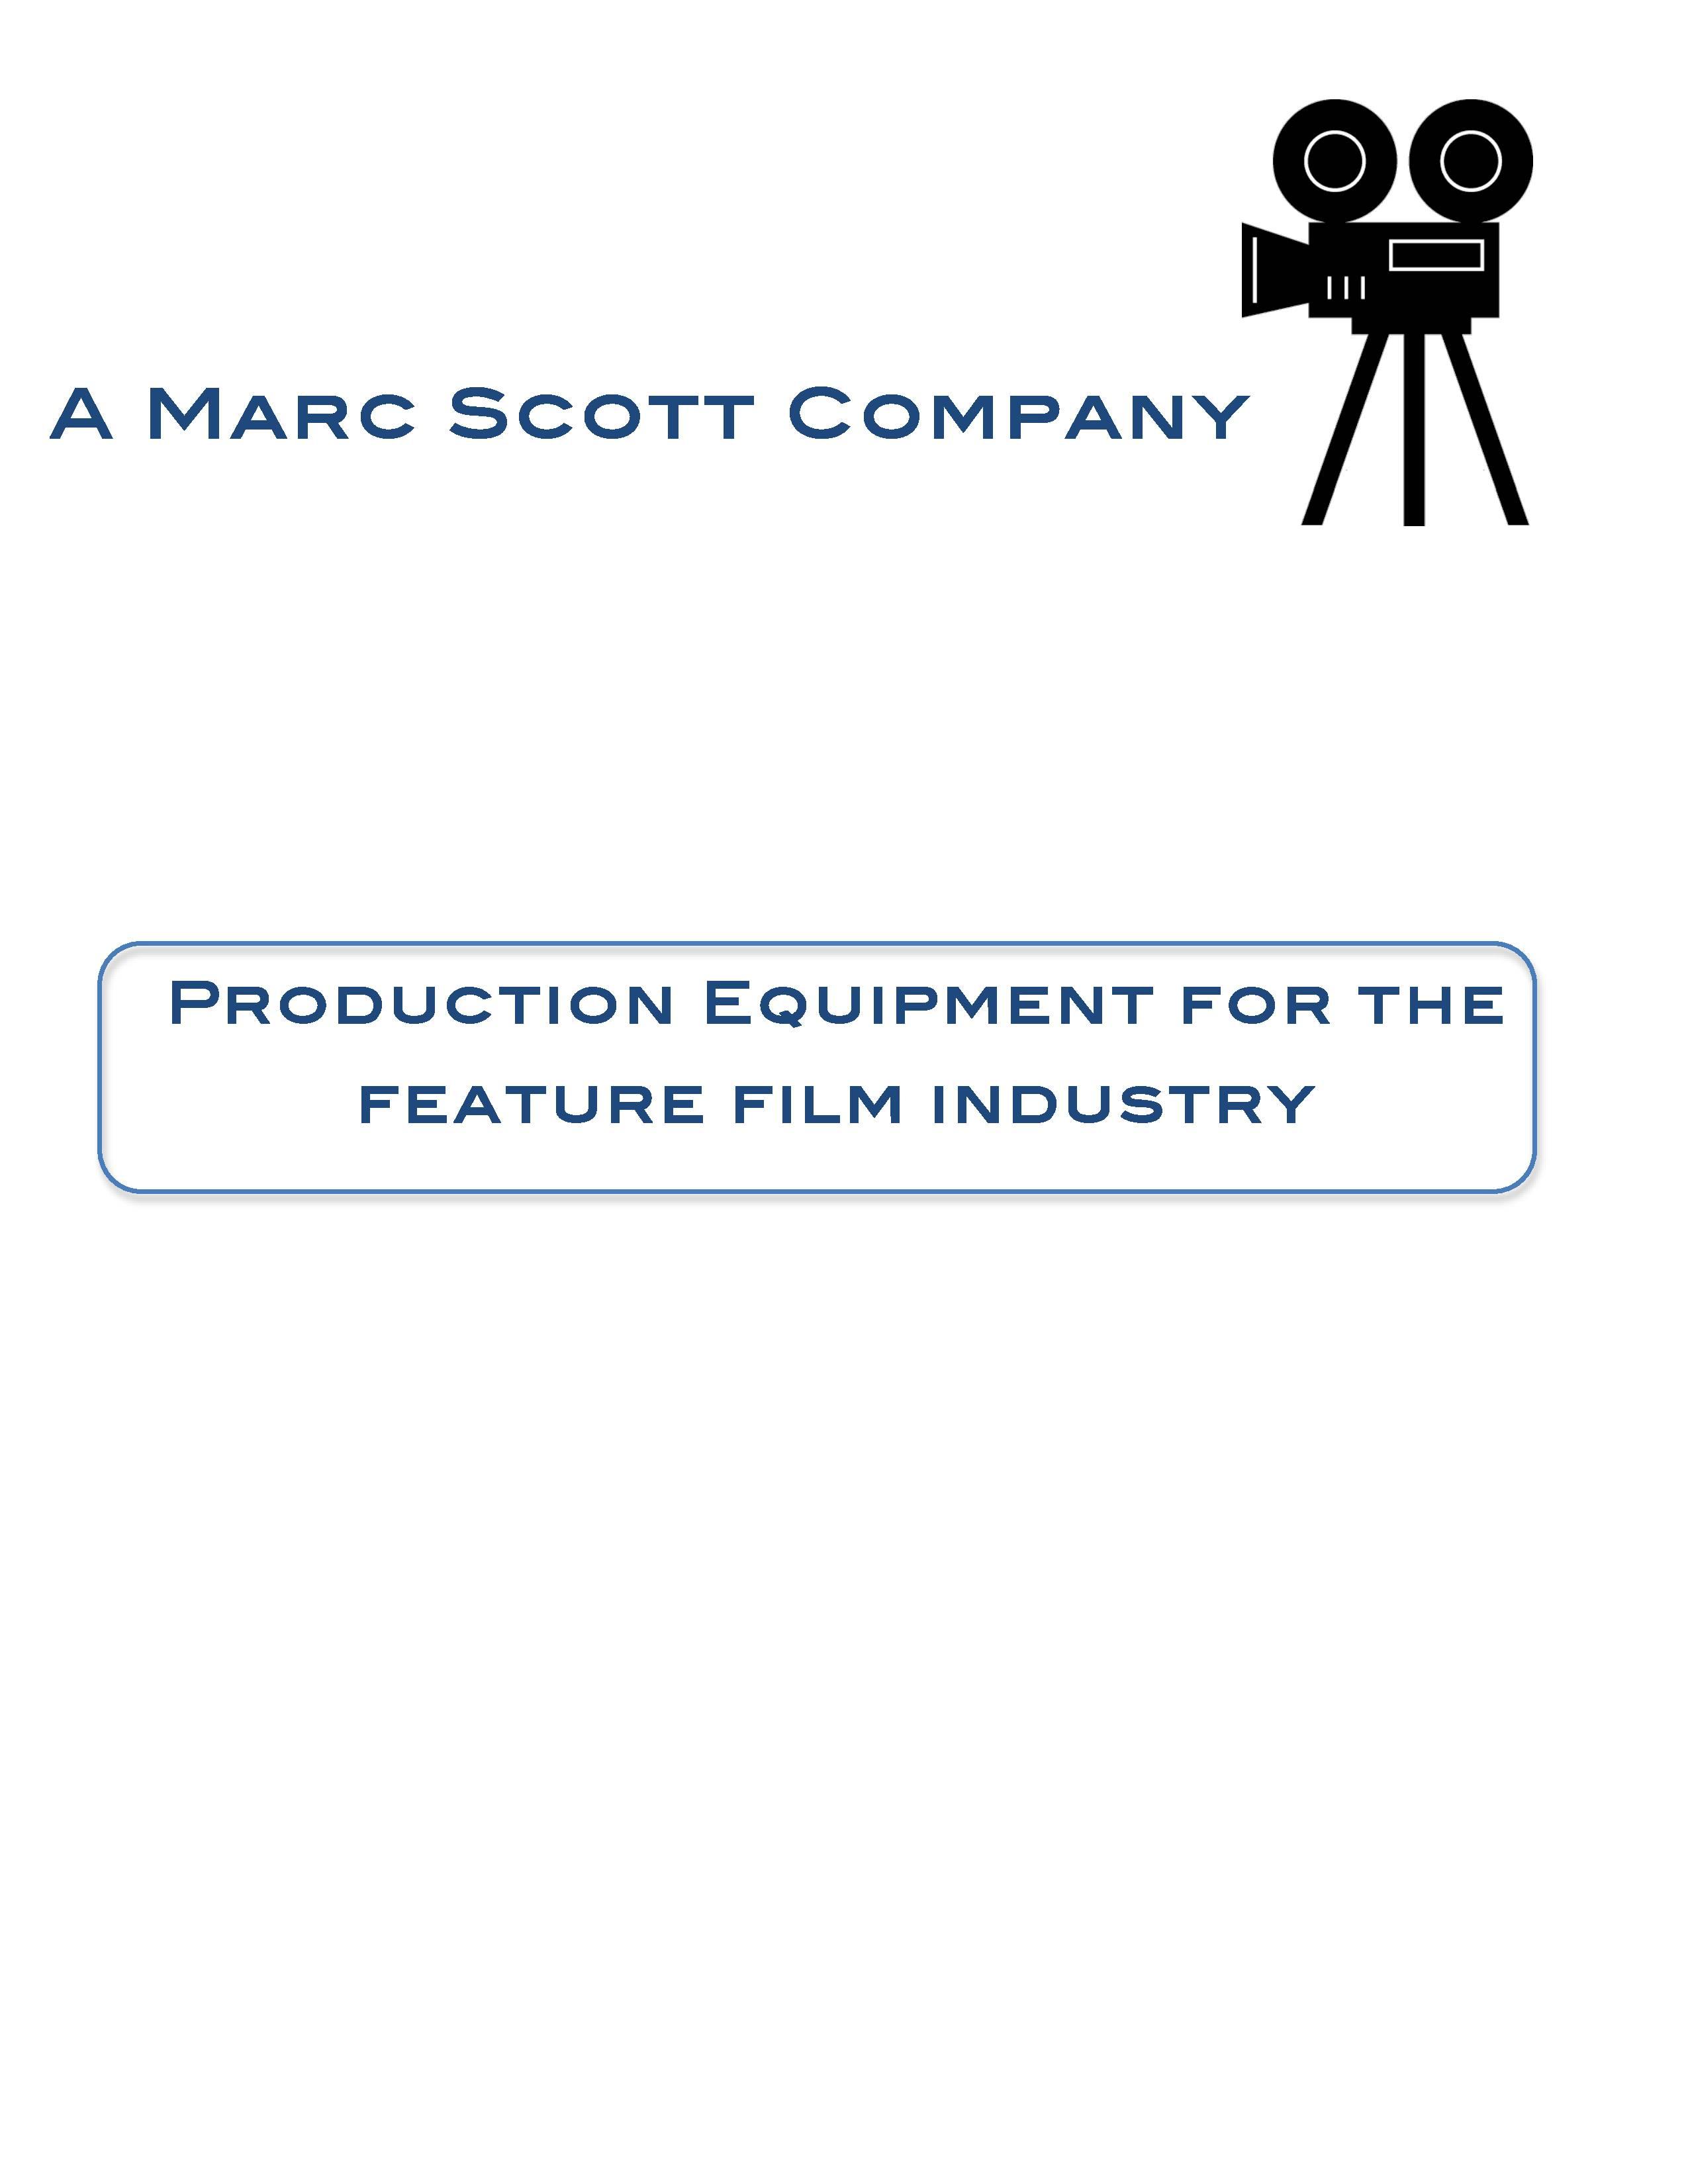 marc-scott-logo